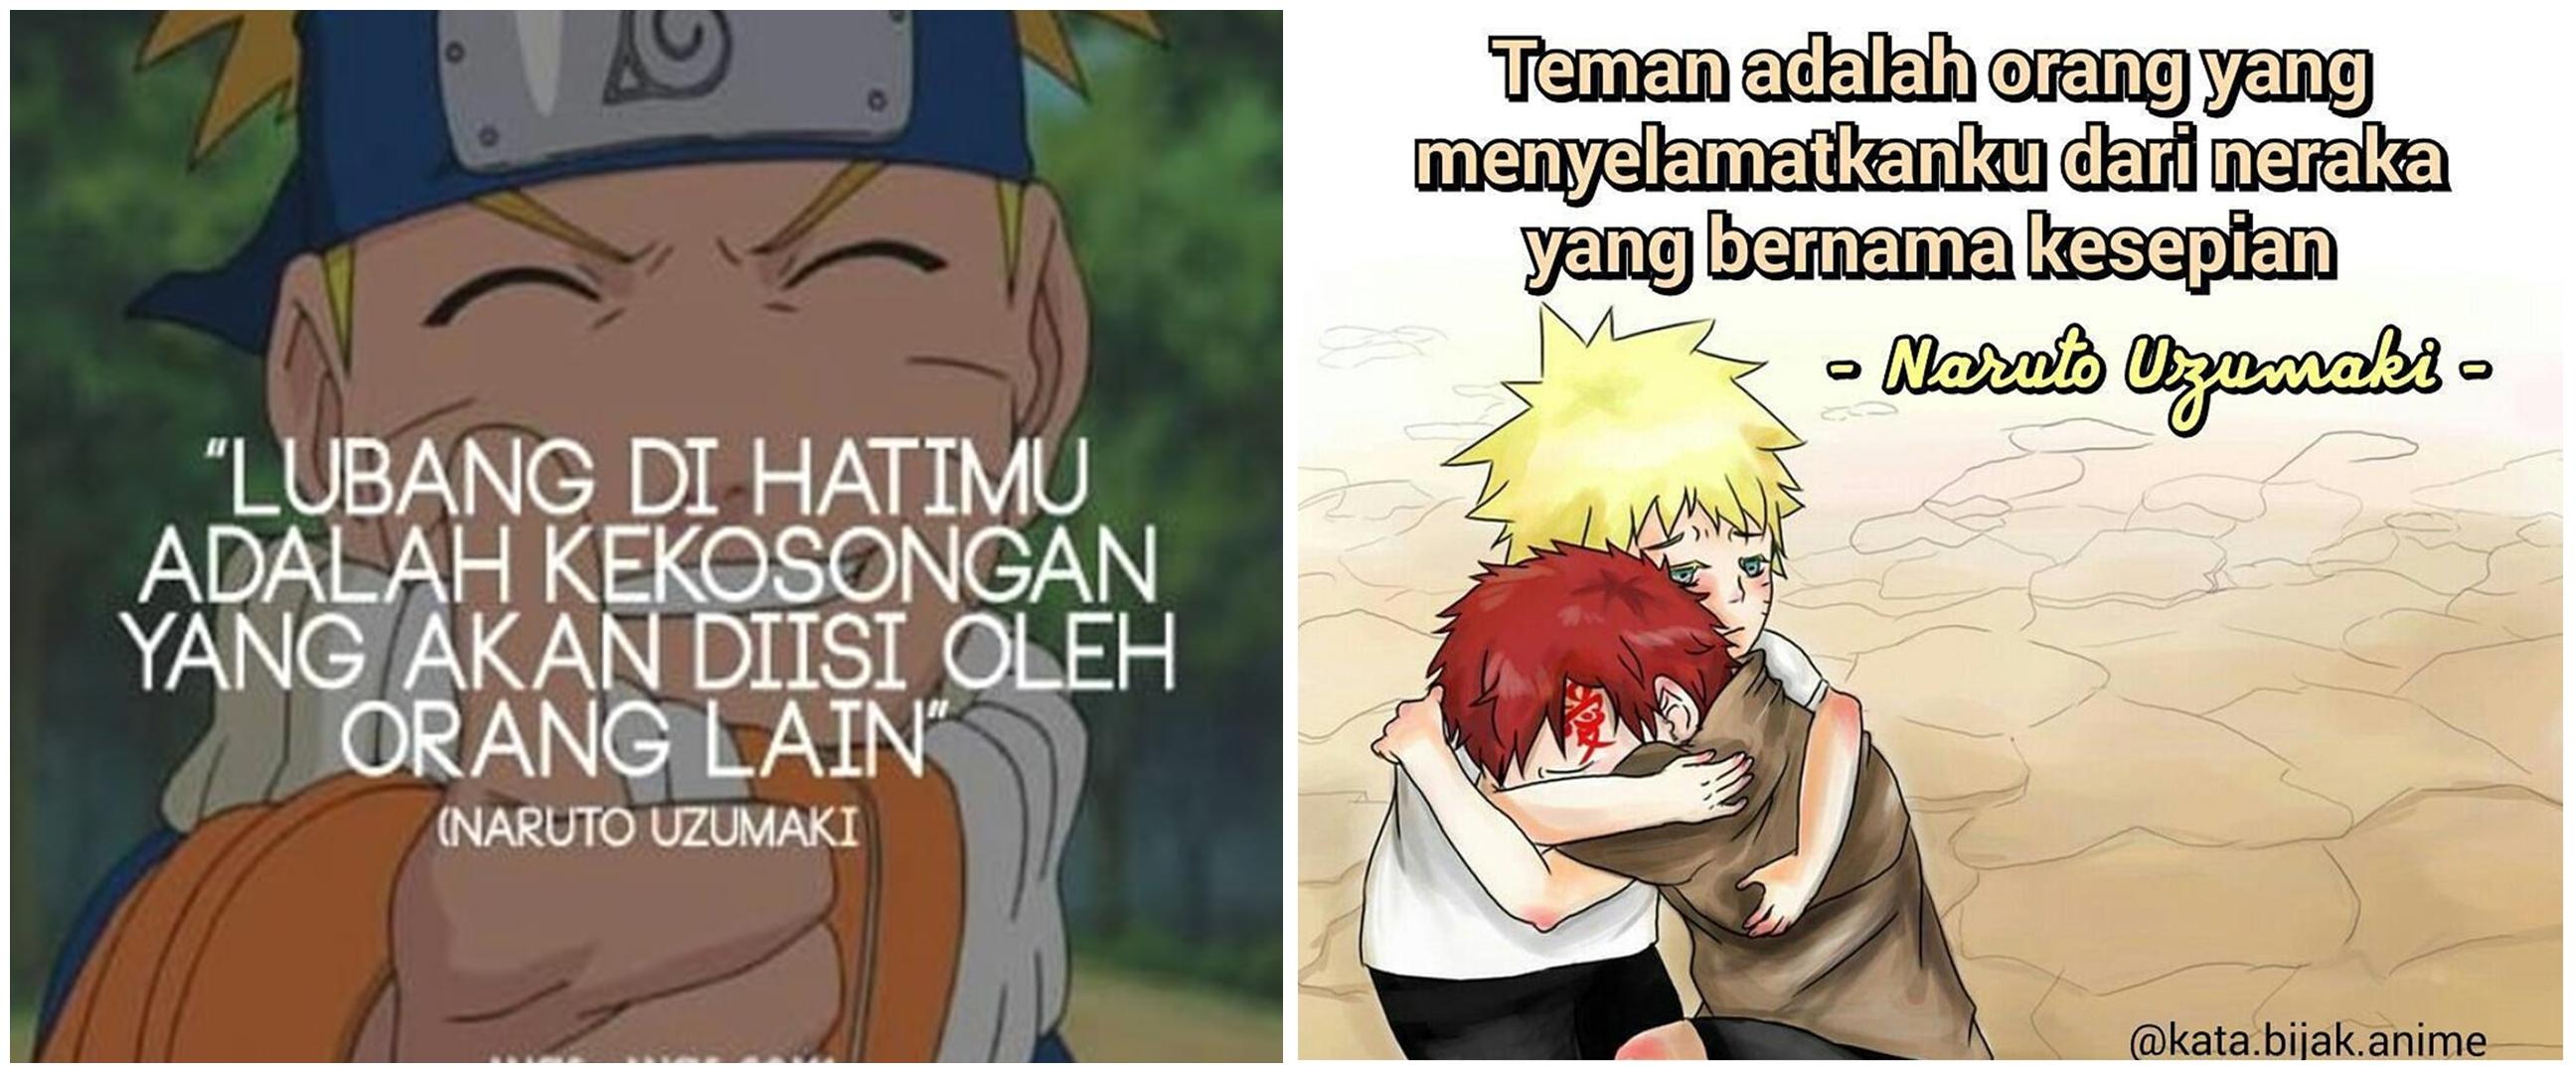 40 Kata-kata bijak Naruto tentang cinta dan persahabatan